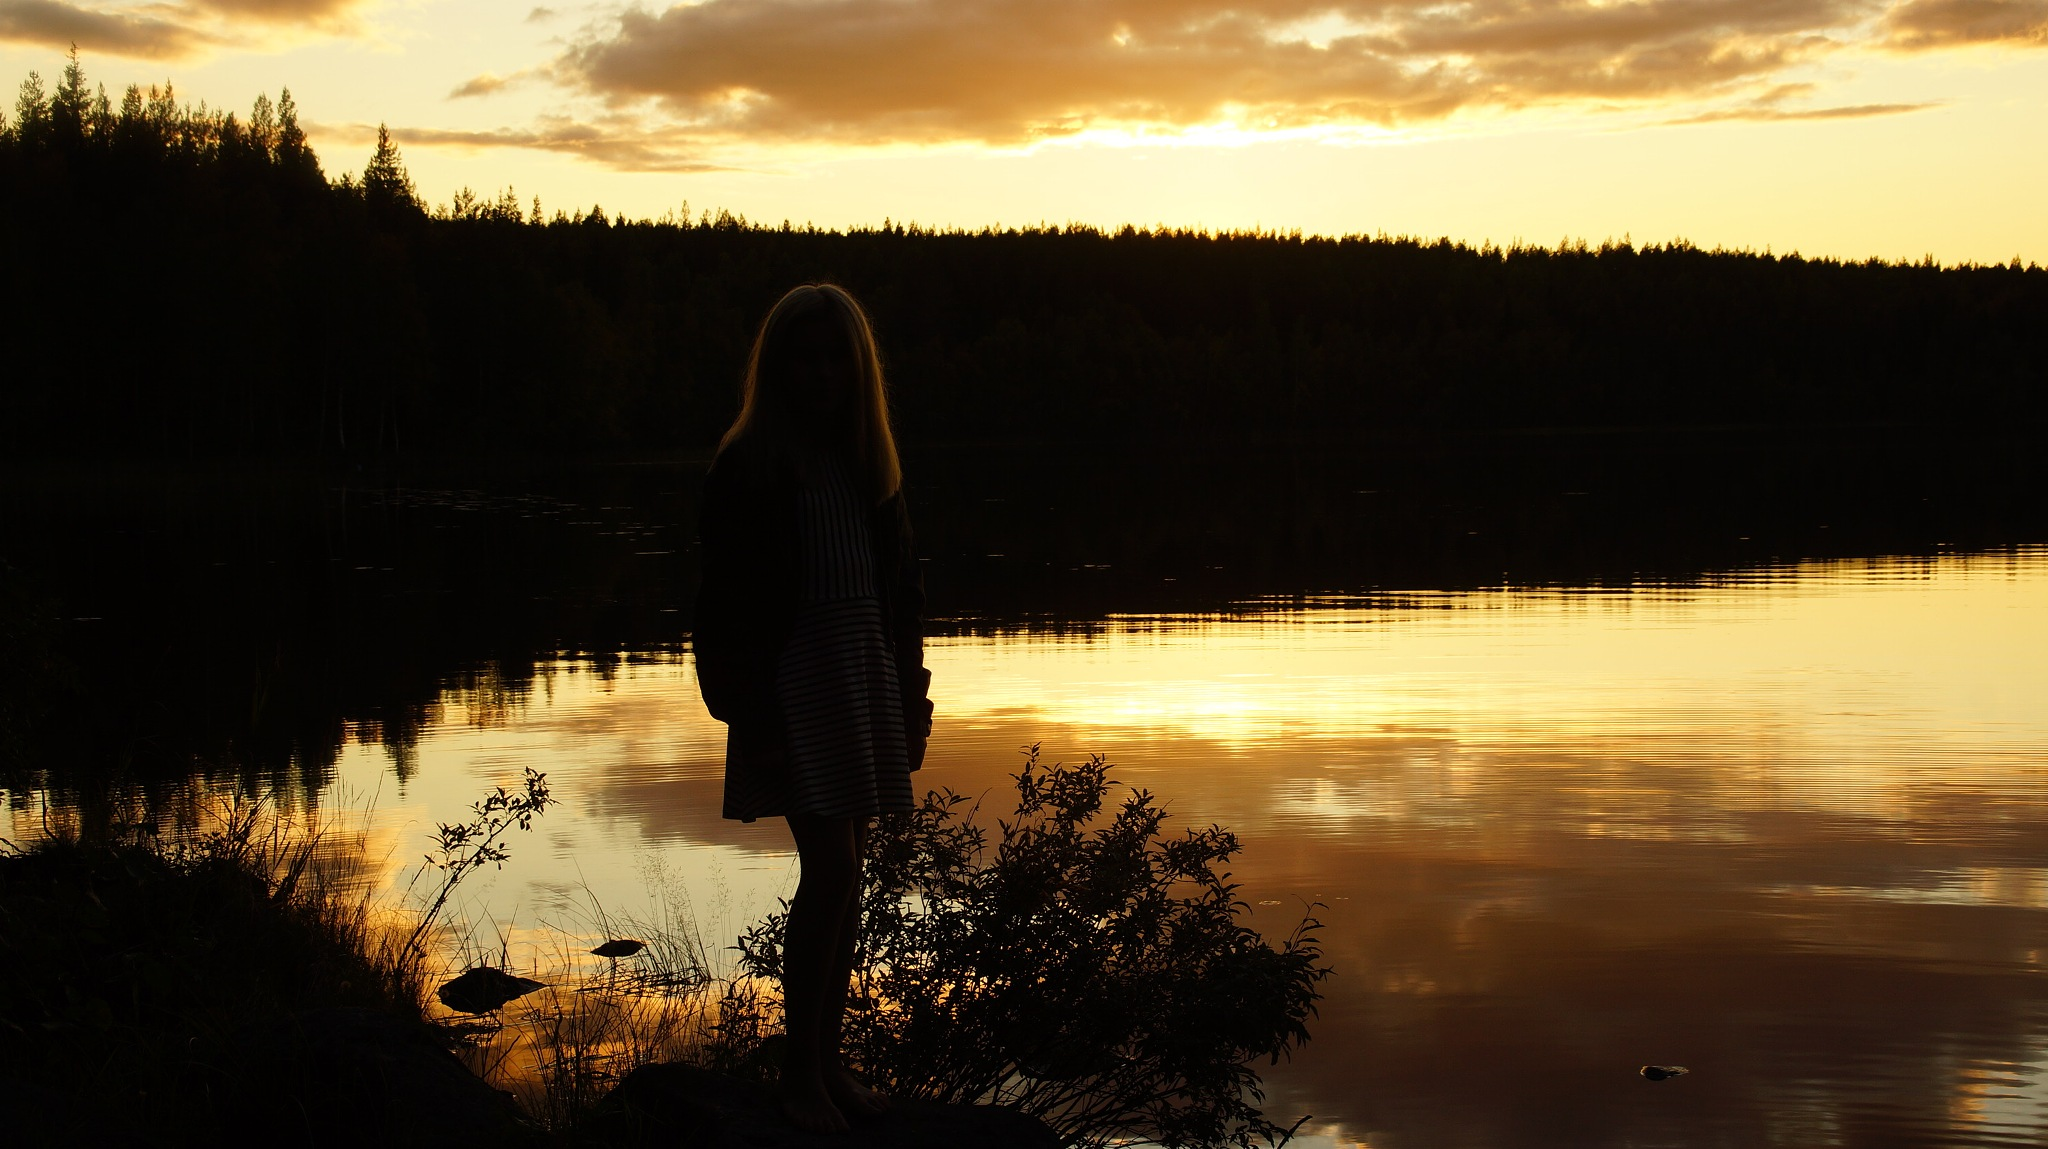 Untitled by kerstin.almqvist.7